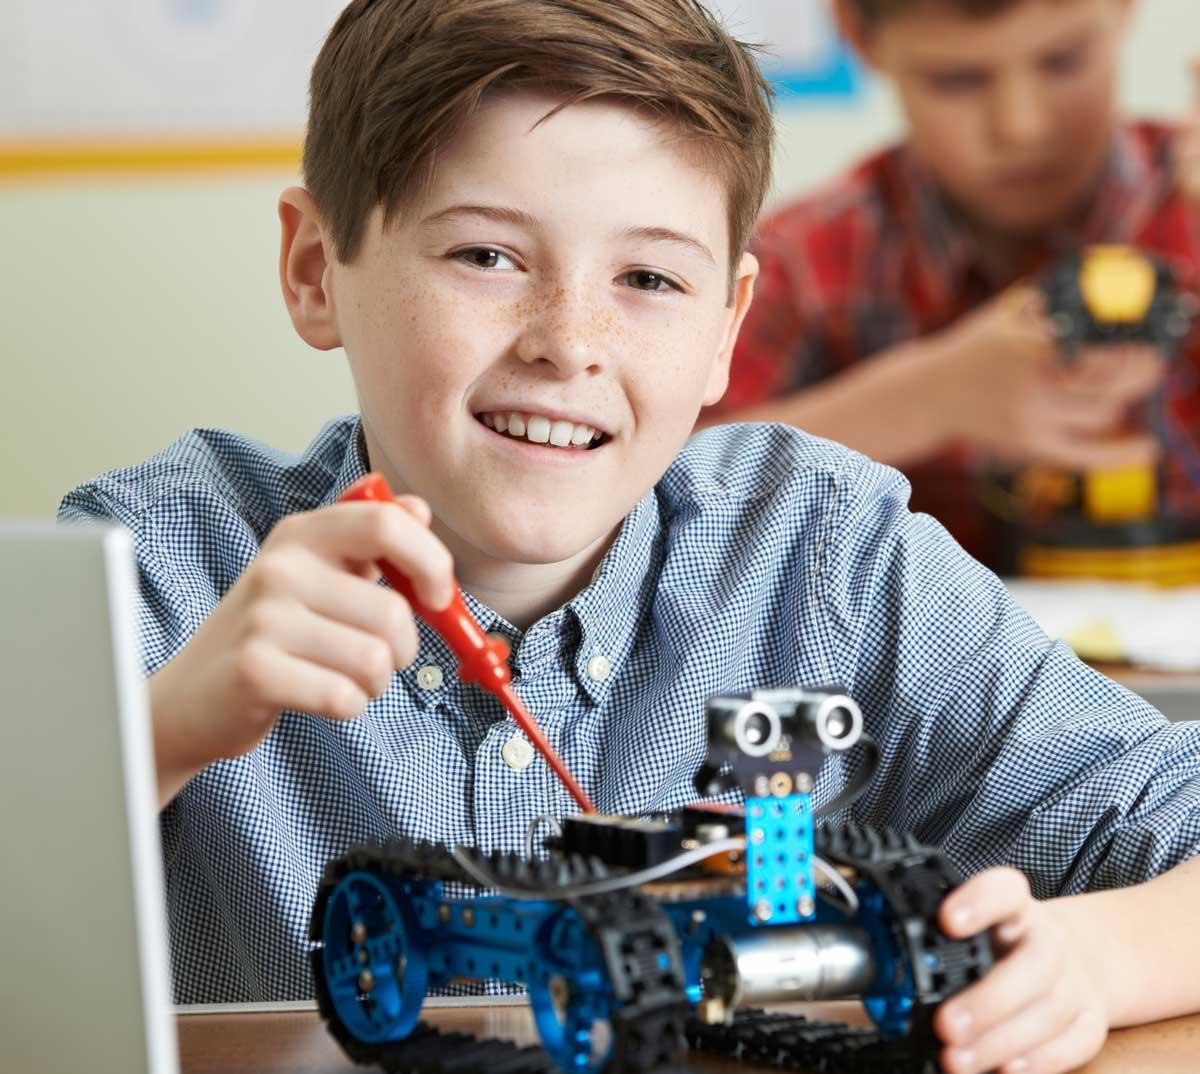 Child working on robot